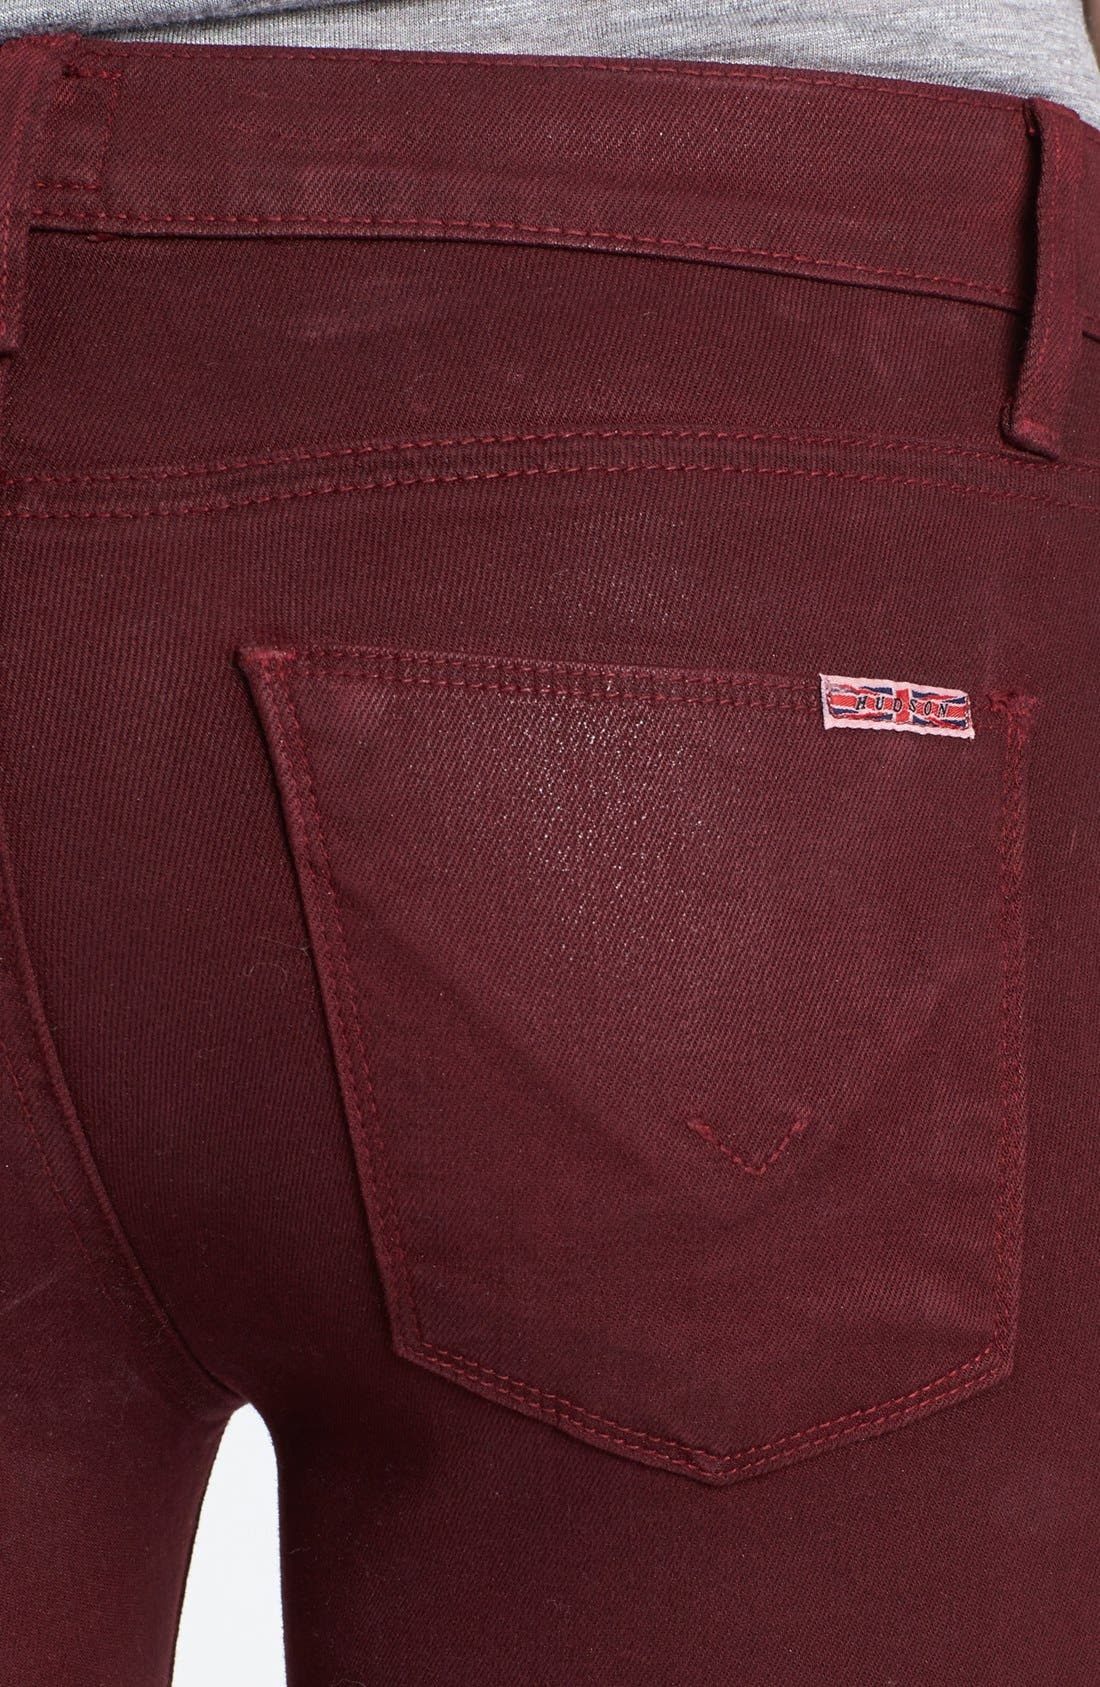 Alternate Image 3  - Hudson Jeans 'Krista' Super Skinny Jeans (Crimson Wax)